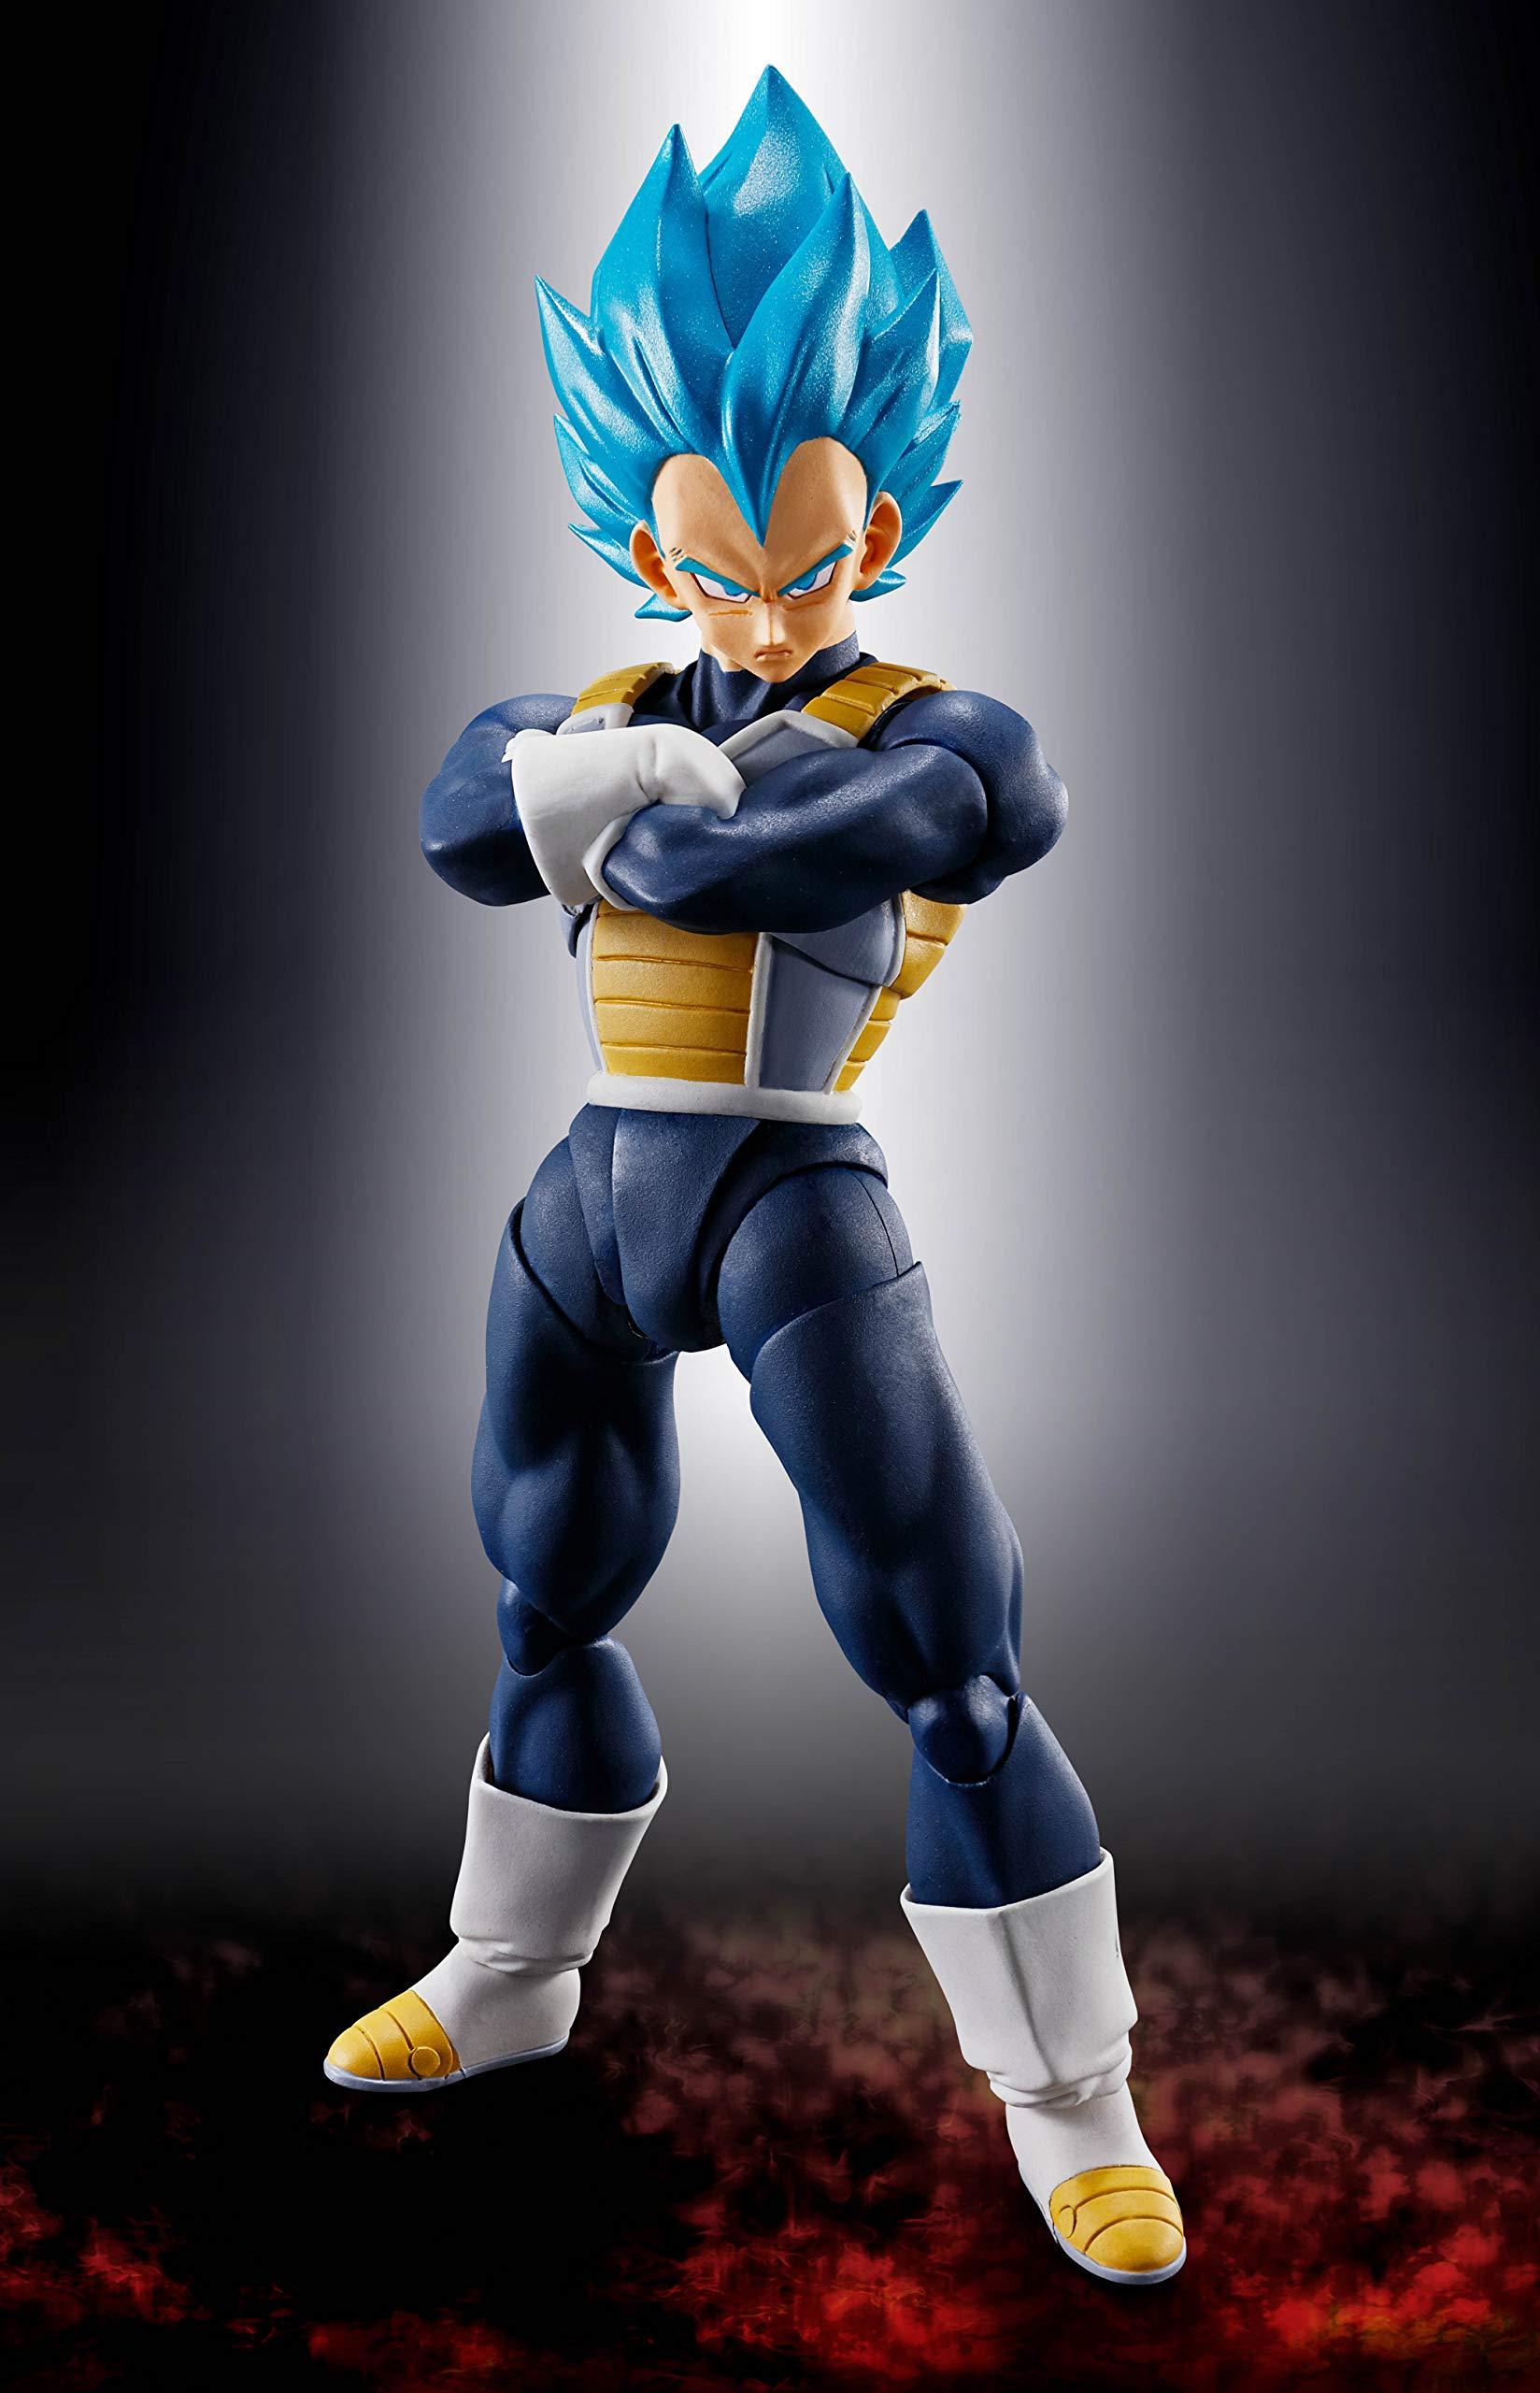 Tamashii Nations Bandai S H Figuarts Super Saiyan God Super Saiyan